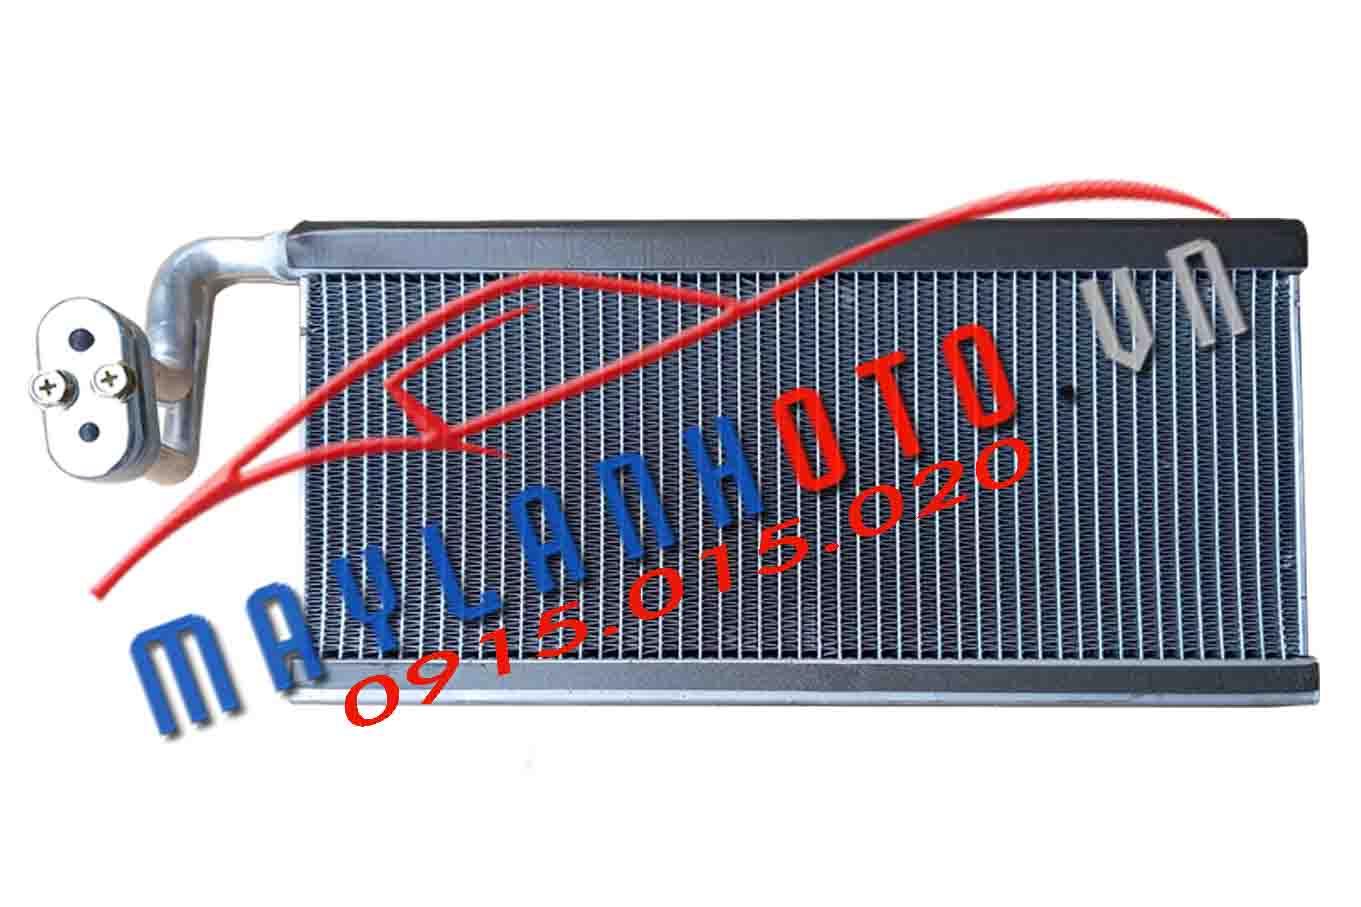 Hyundai 55-Dàn lạnh Hyundai 55-Giàn lạnh Hyundai 55